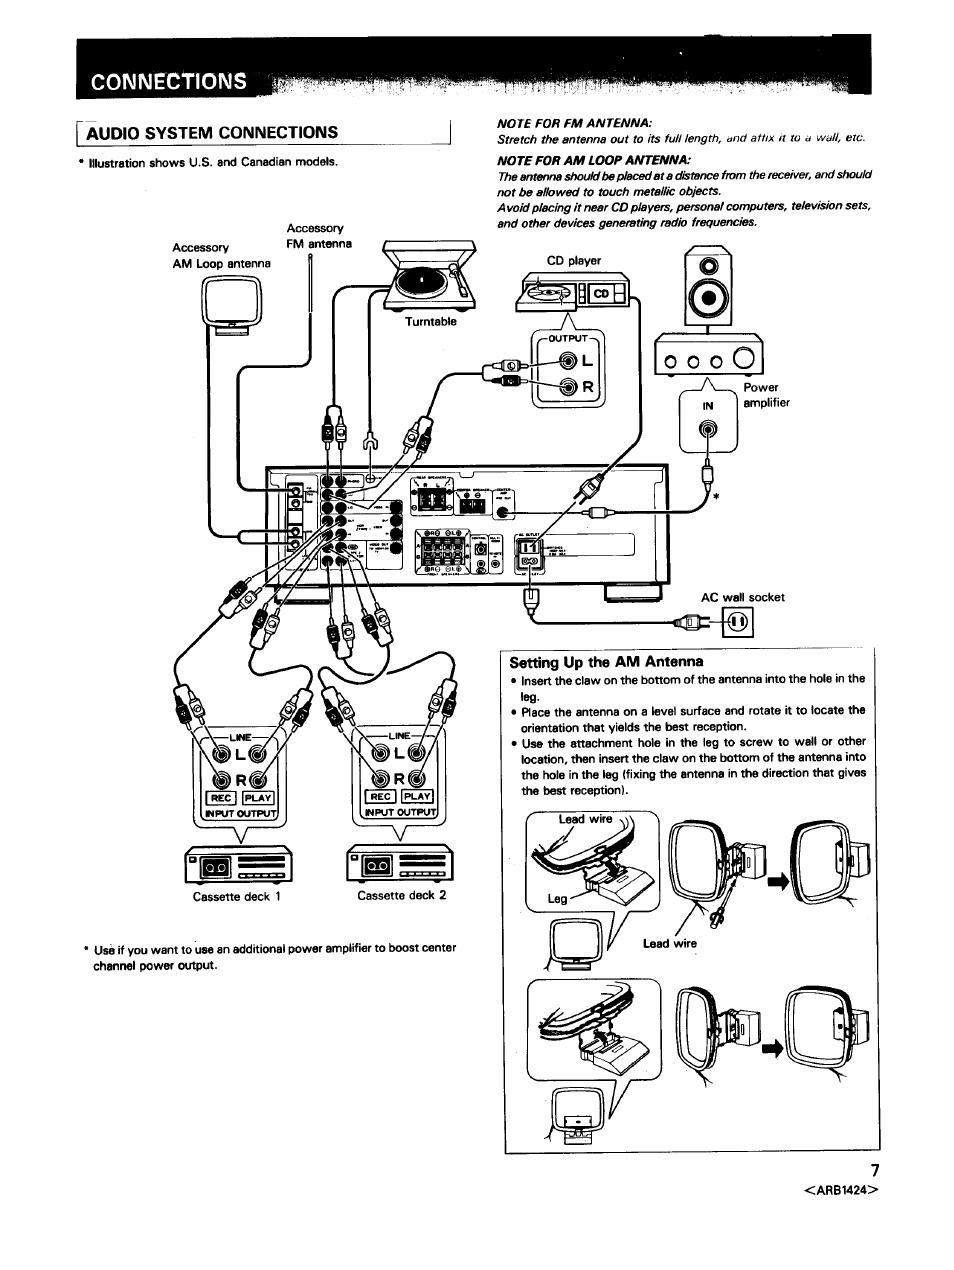 1995 Chevrolet Lumina Fuse Box. Chevrolet. Auto Fuse Box